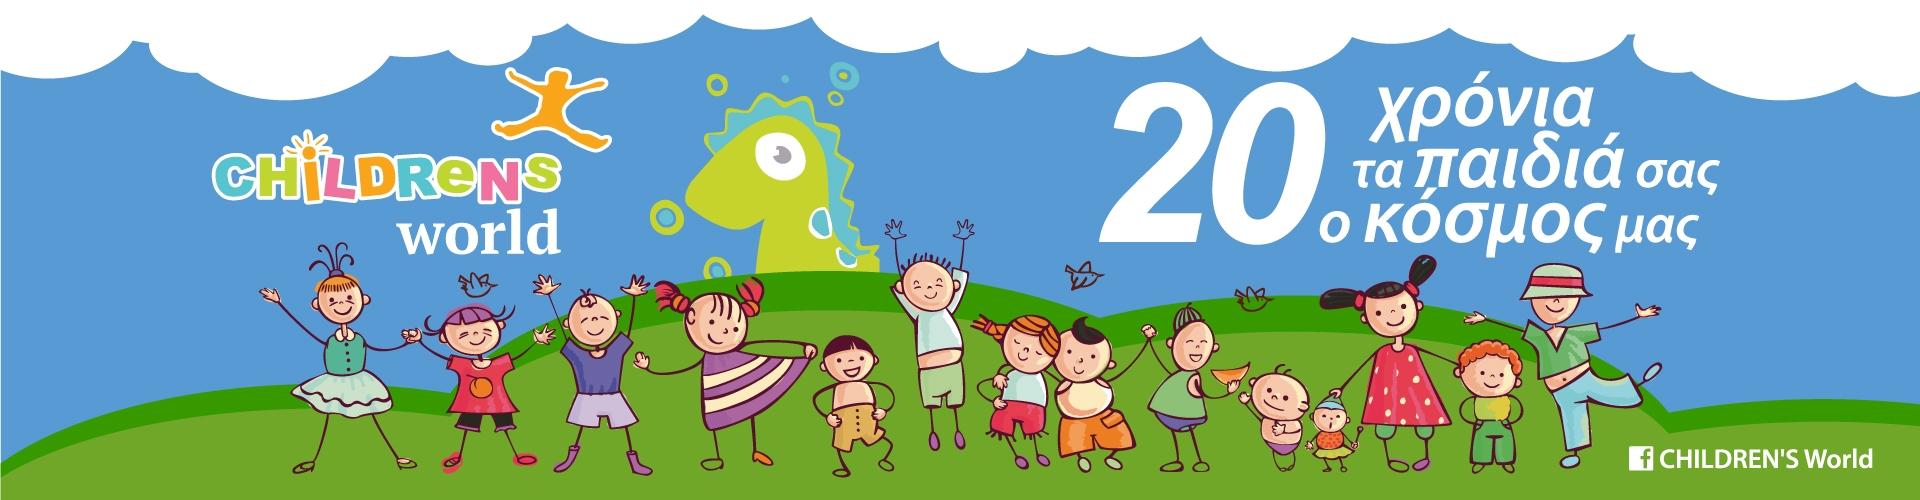 Childrens World